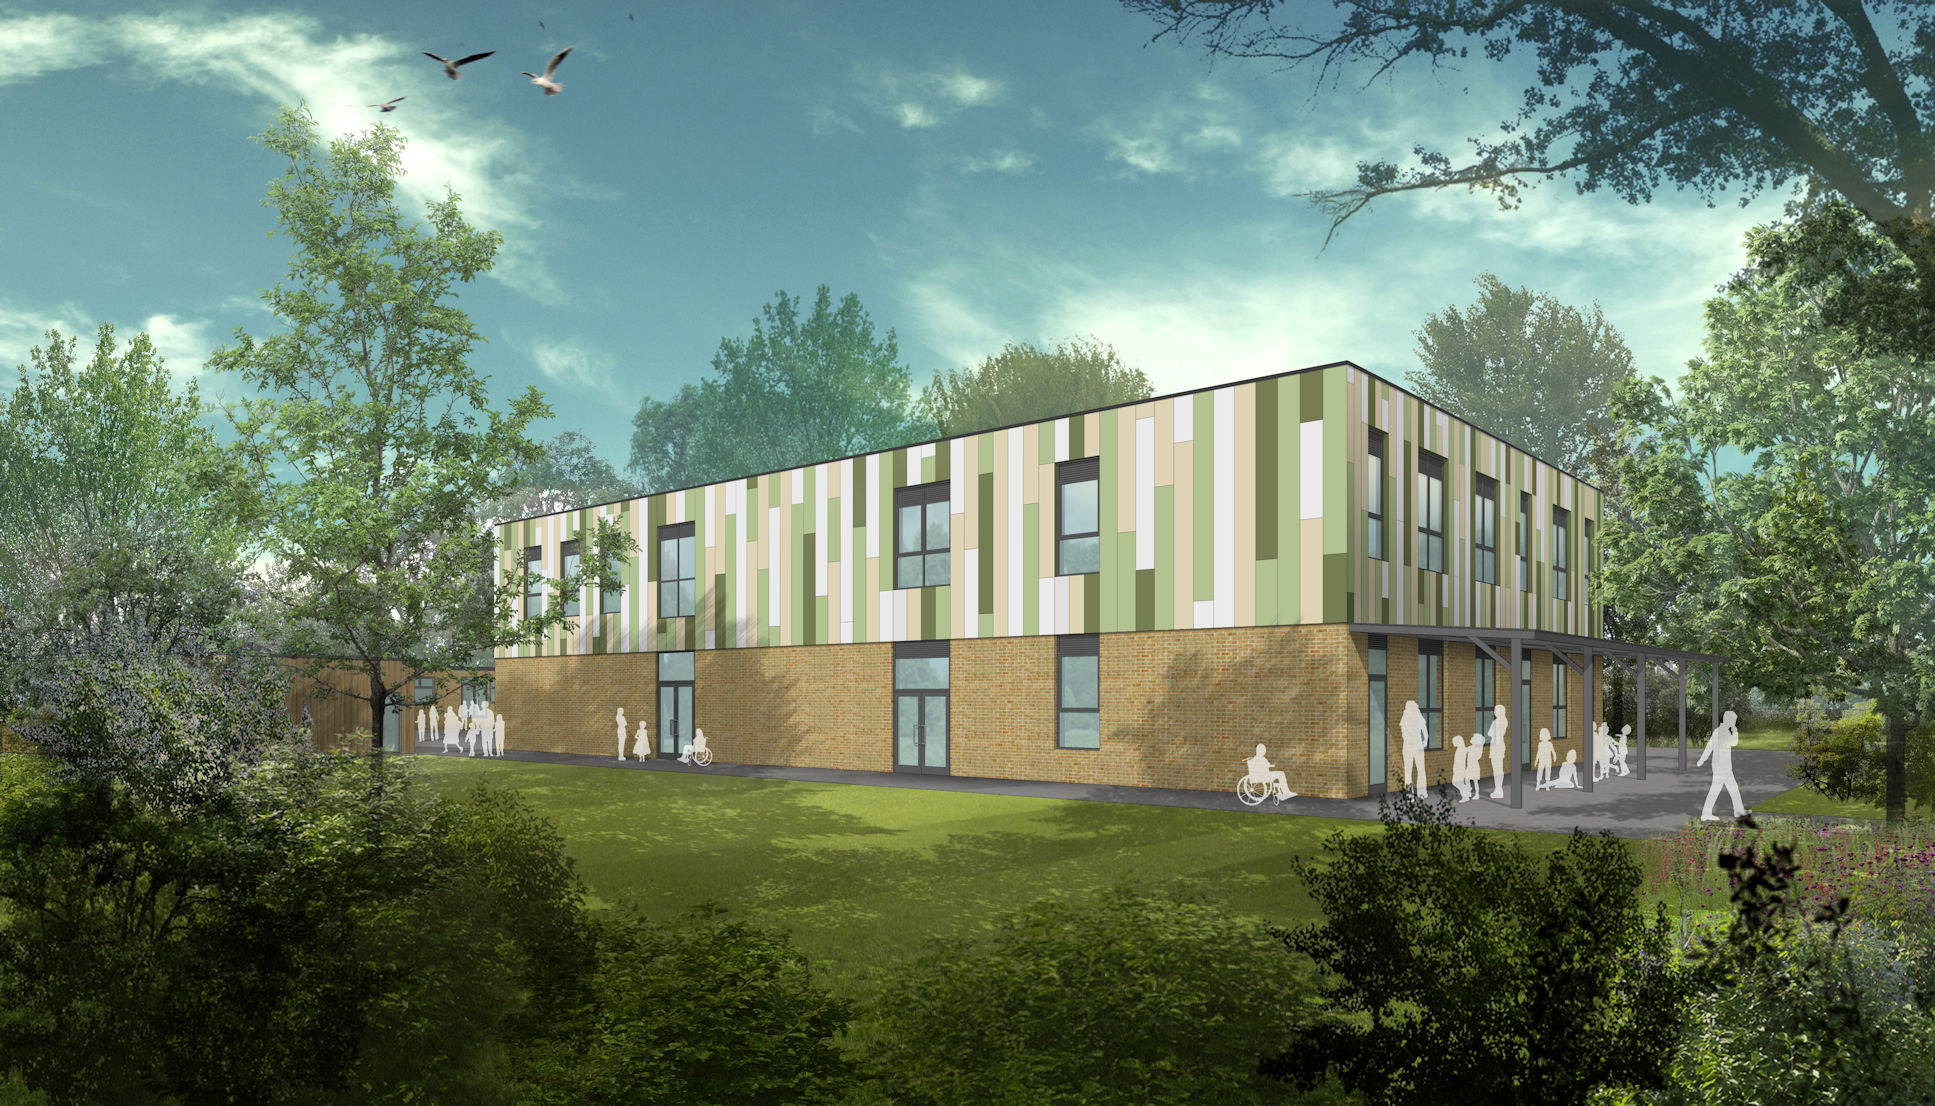 Eresby School External 2 - mid.jpg